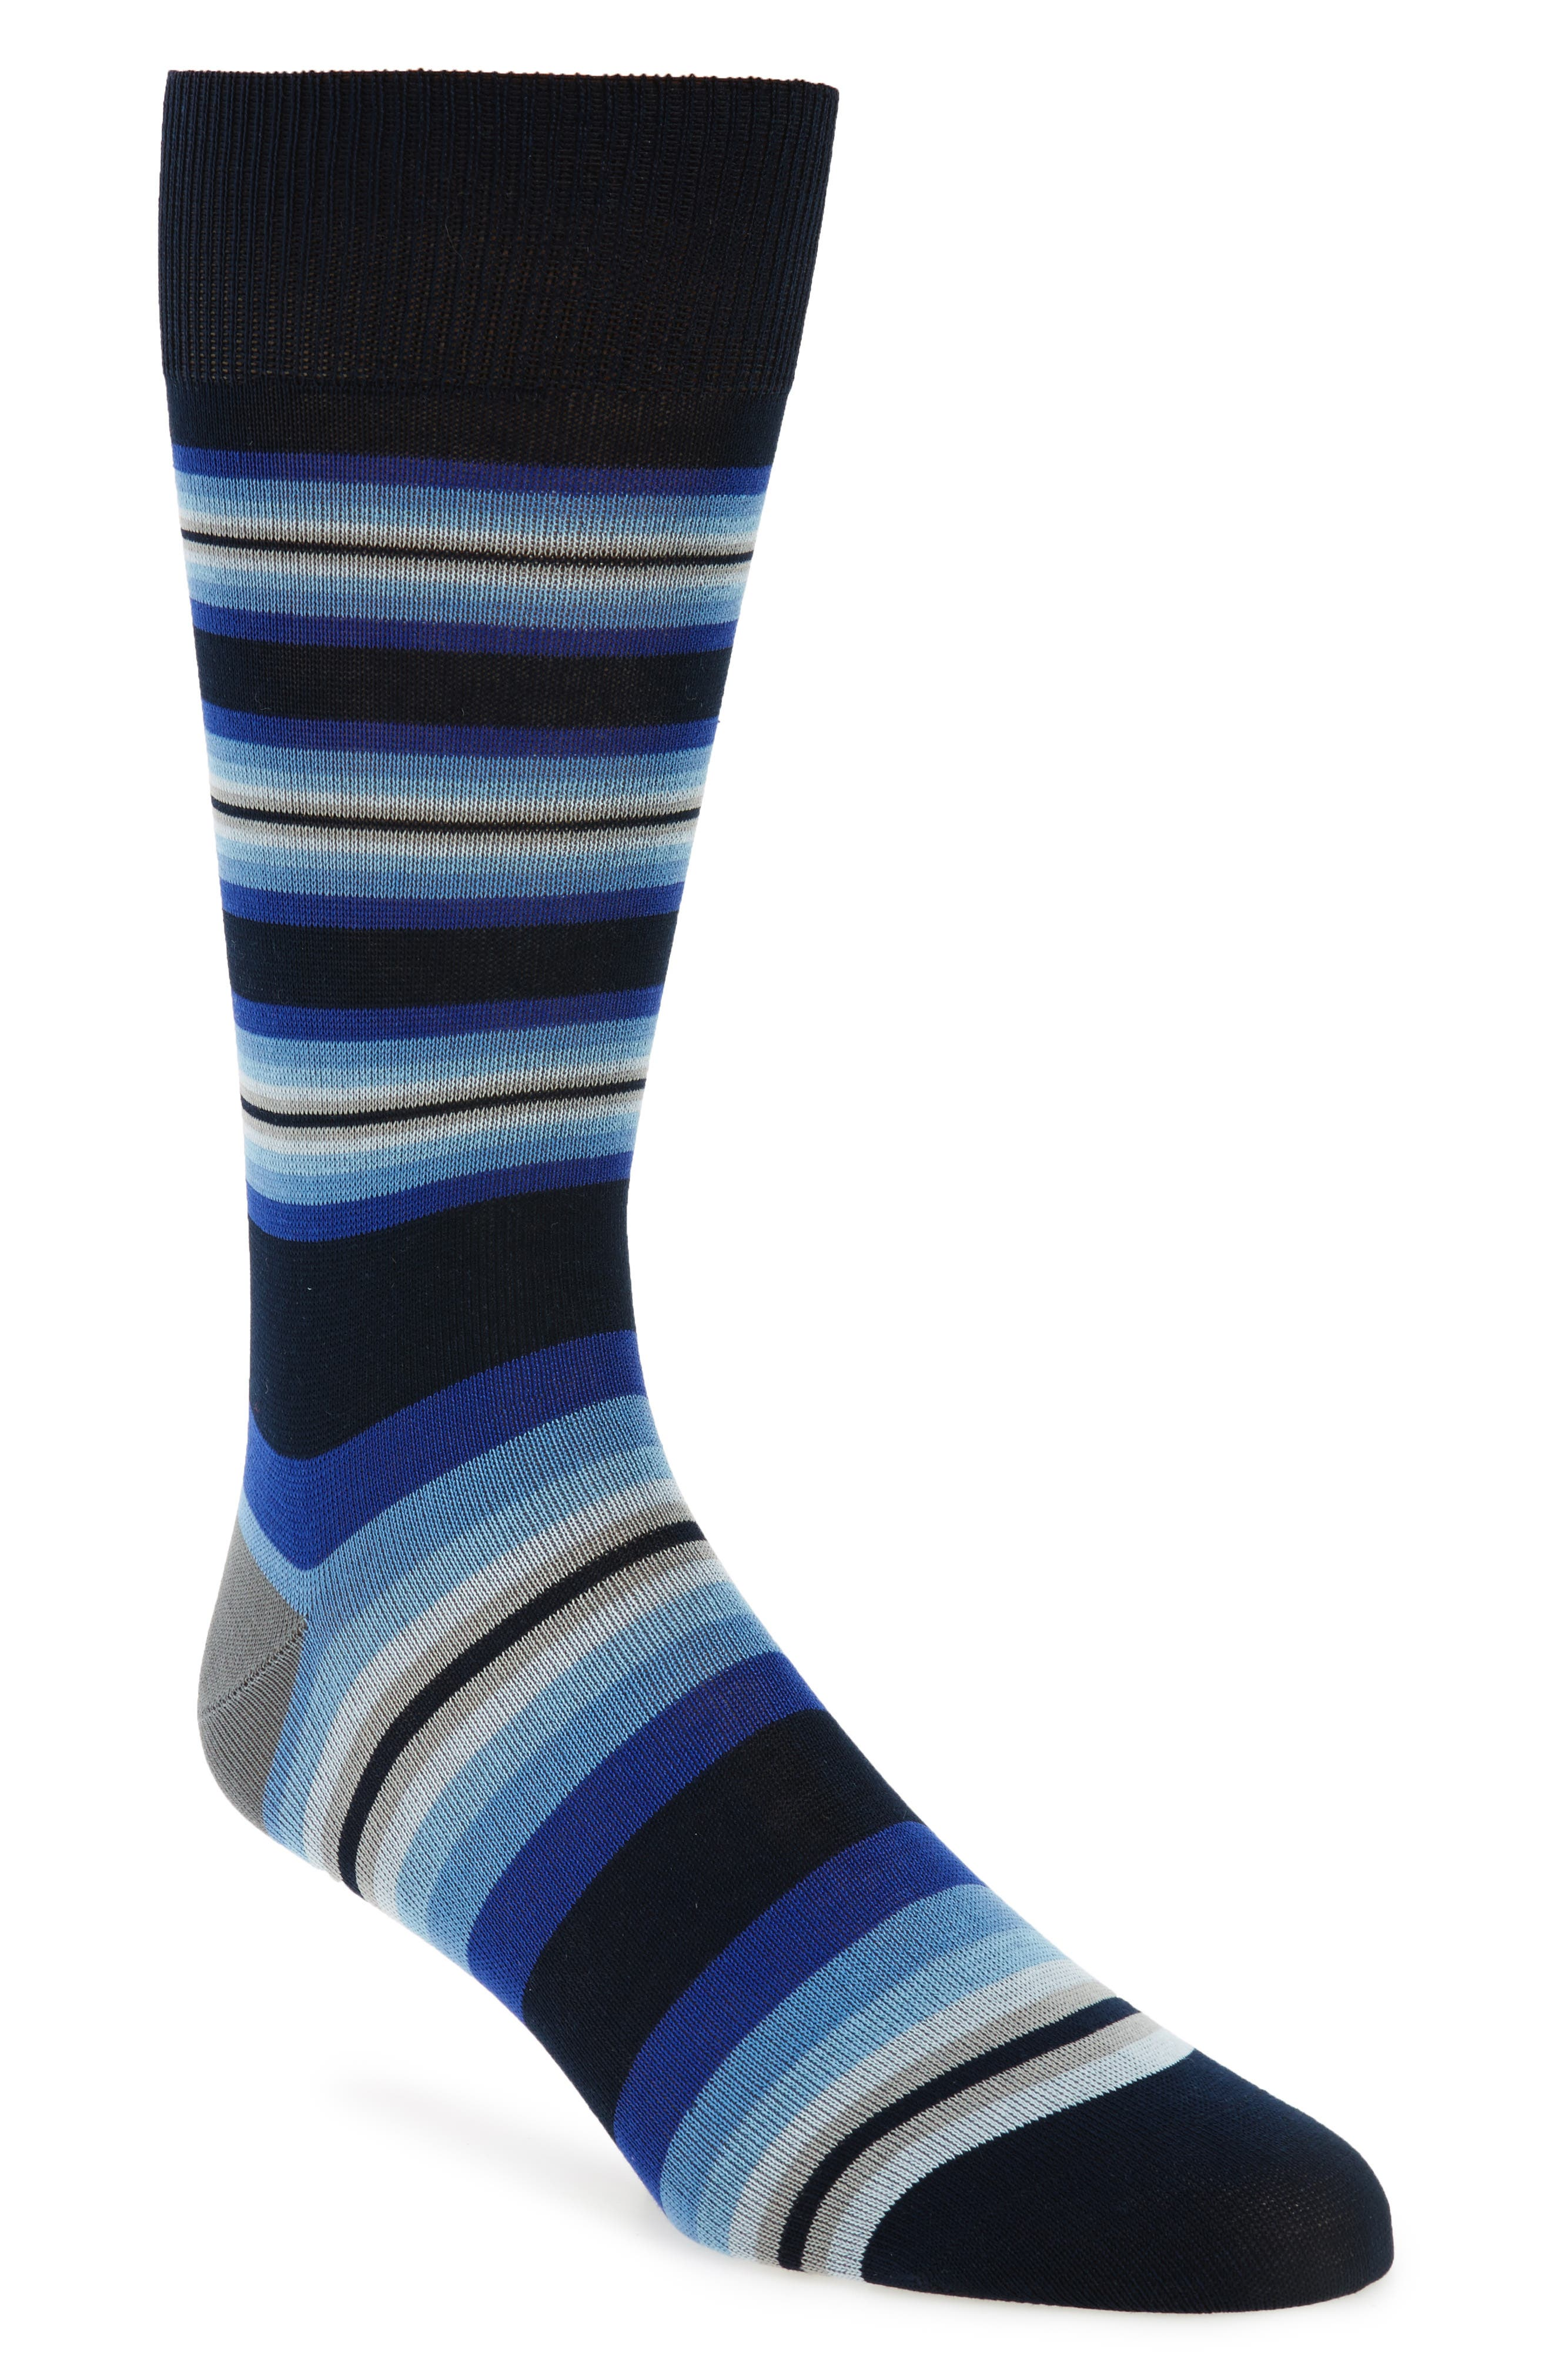 Tiger Stripe Socks,                         Main,                         color, Blue/ Dark Blue